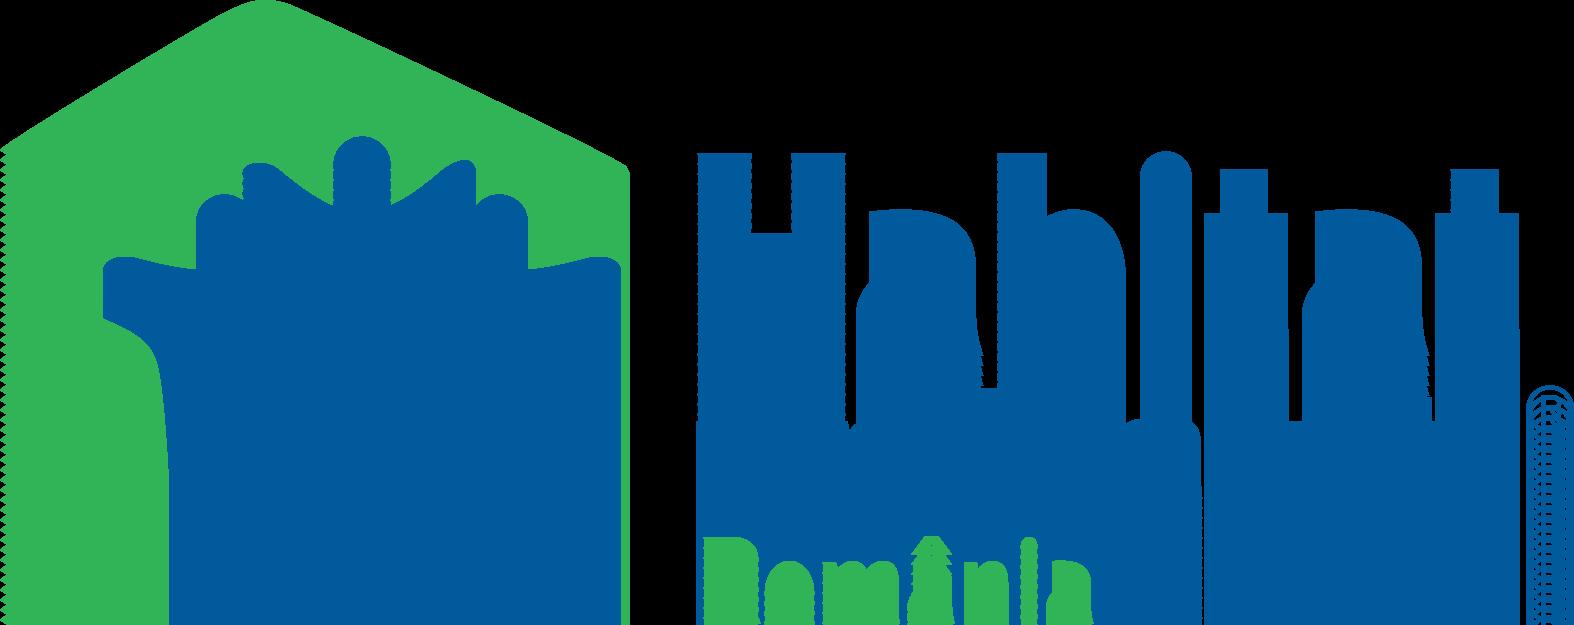 Habitat for Humanity România